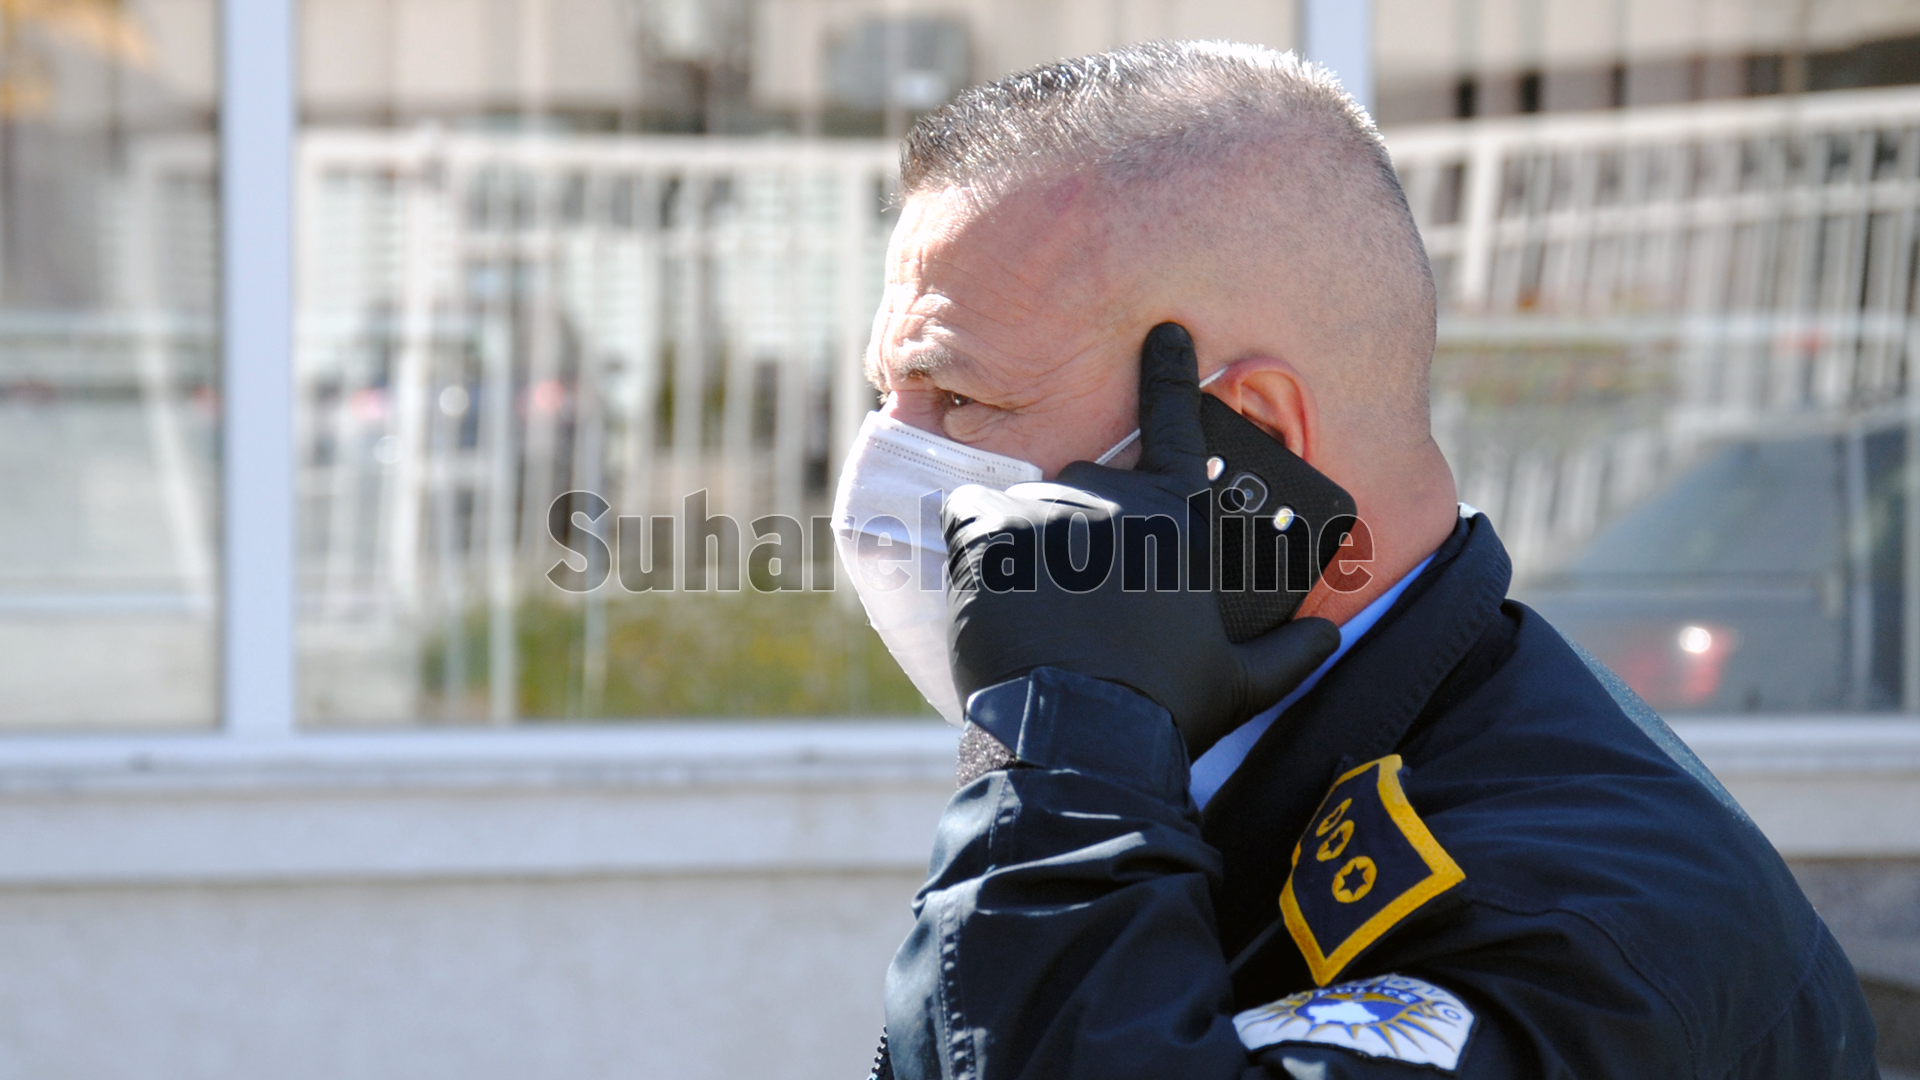 Ligji anti-COVID, Policia e Suharekës dënon 194 qytetar brenda 2 jave